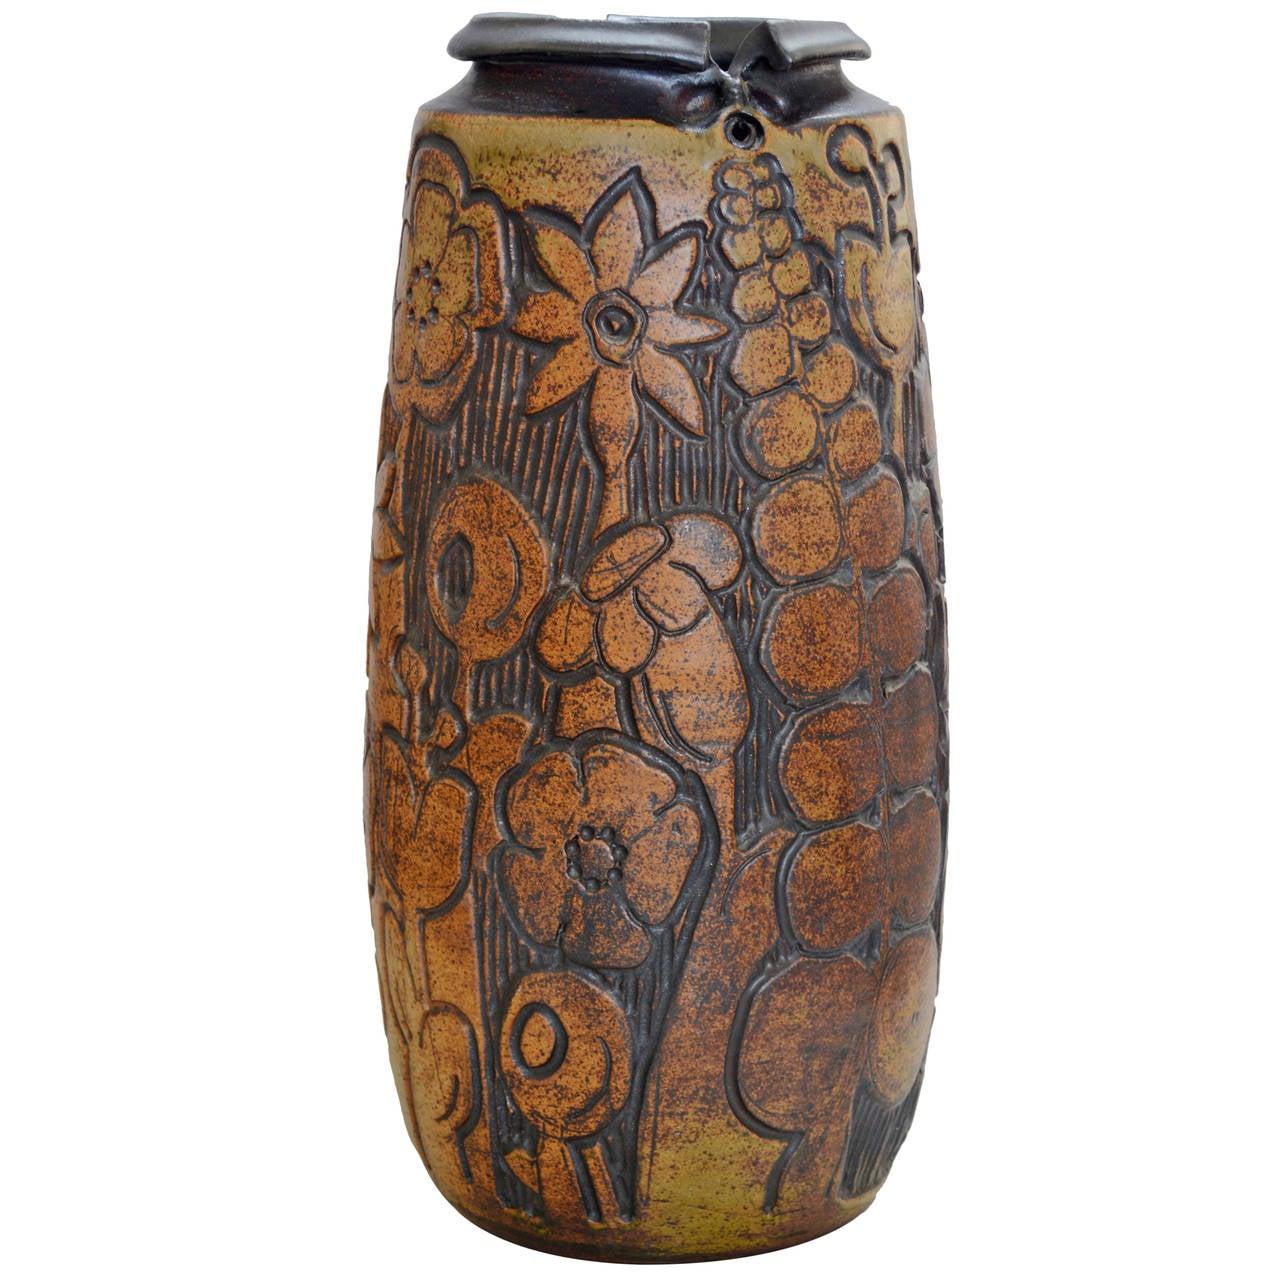 Monumental andrew bergloff studio pottery floor vase for sale at monumental andrew bergloff studio pottery floor vase for sale reviewsmspy